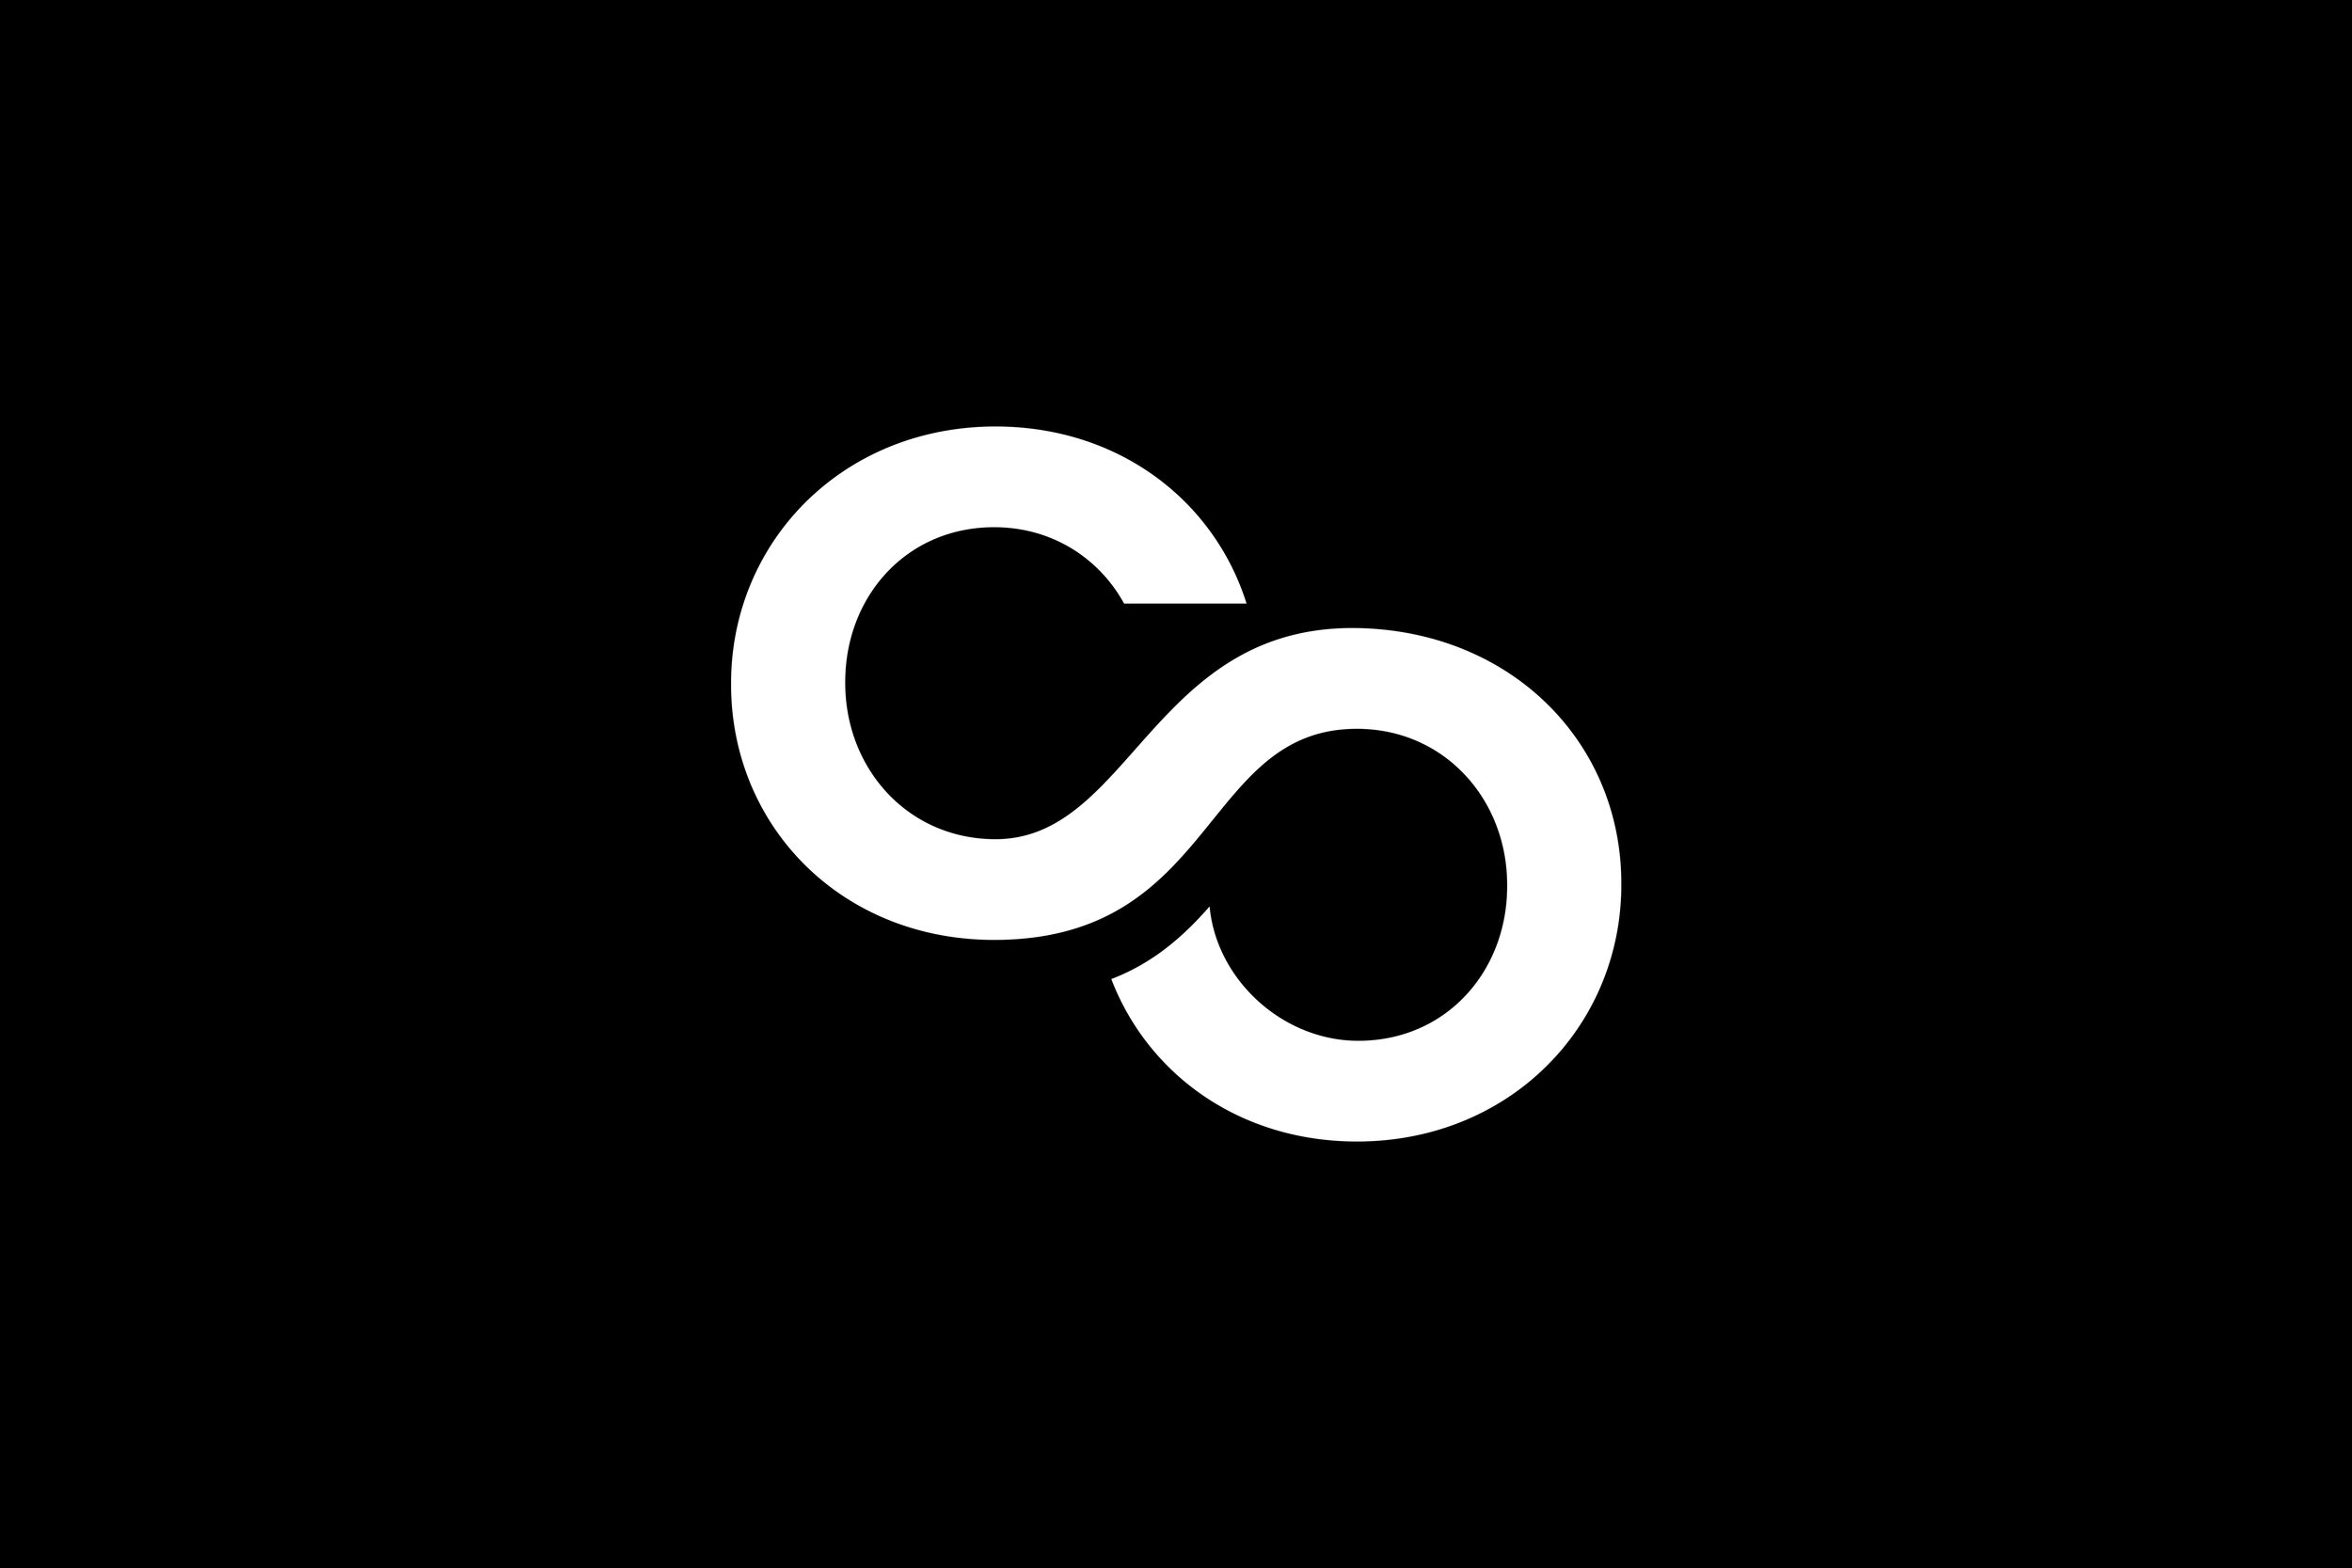 TCN_Folio-logomark-black.jpg